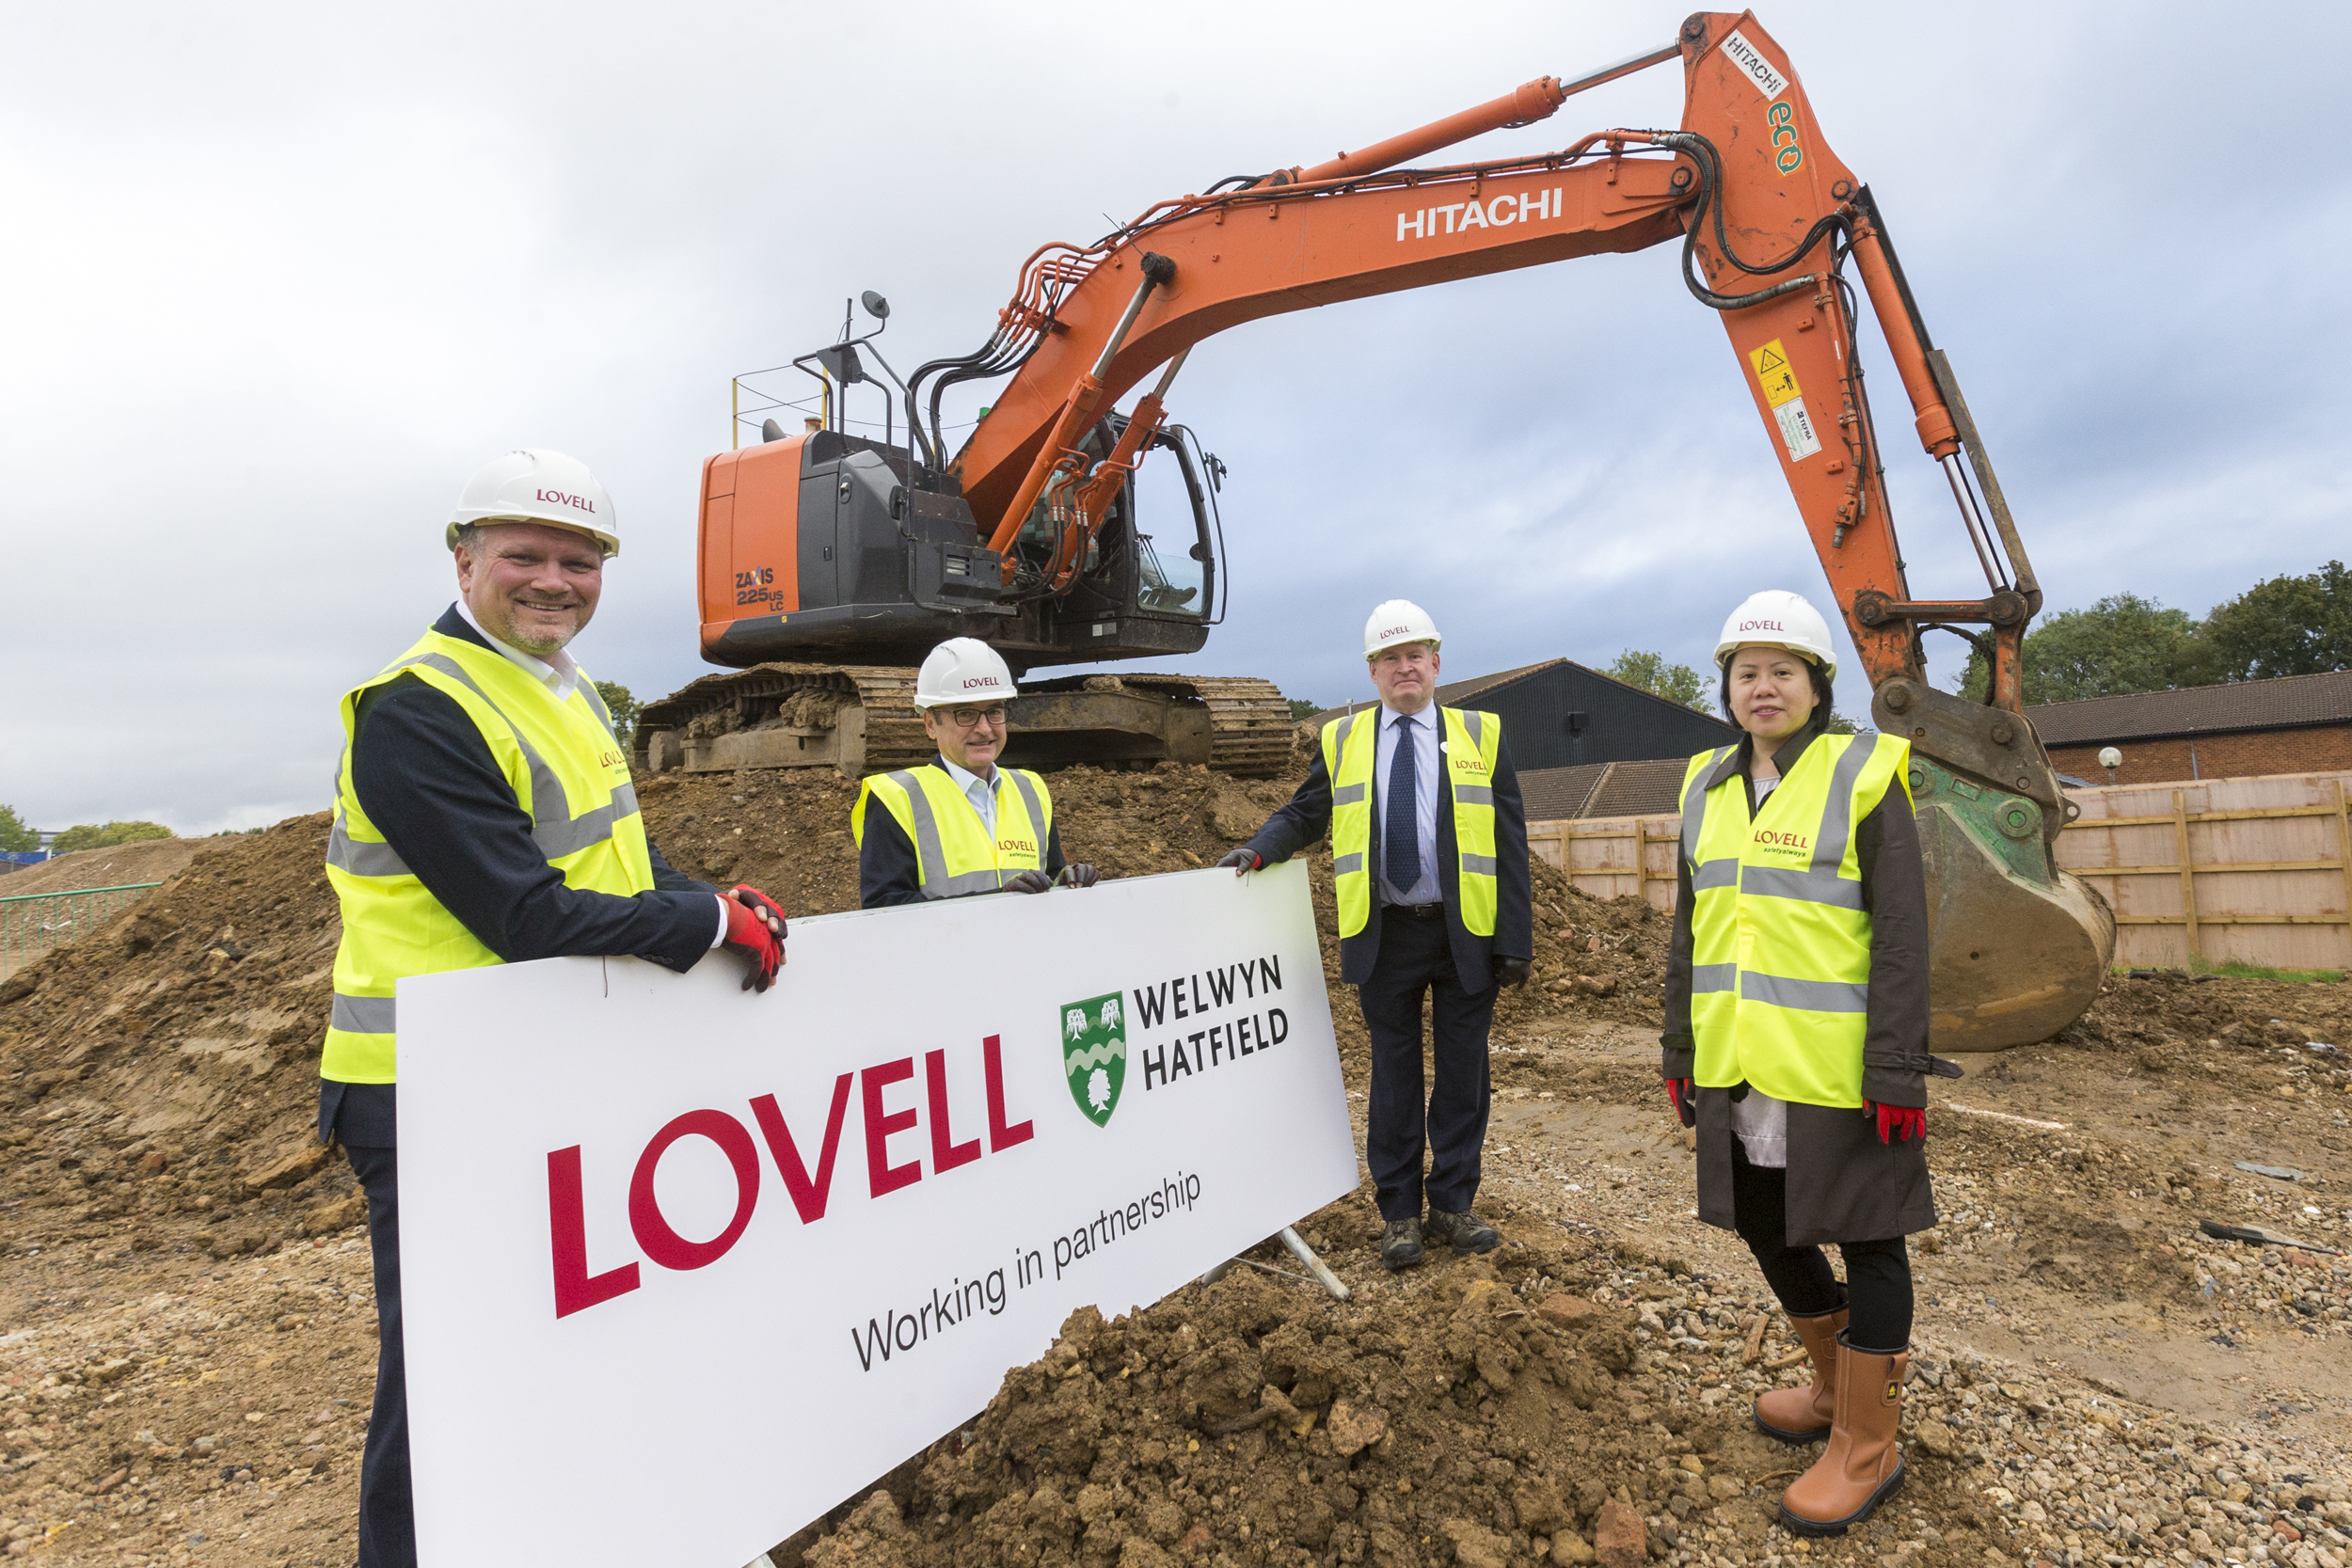 Ground breaking marks start of major new £45m regeneration scheme in High View